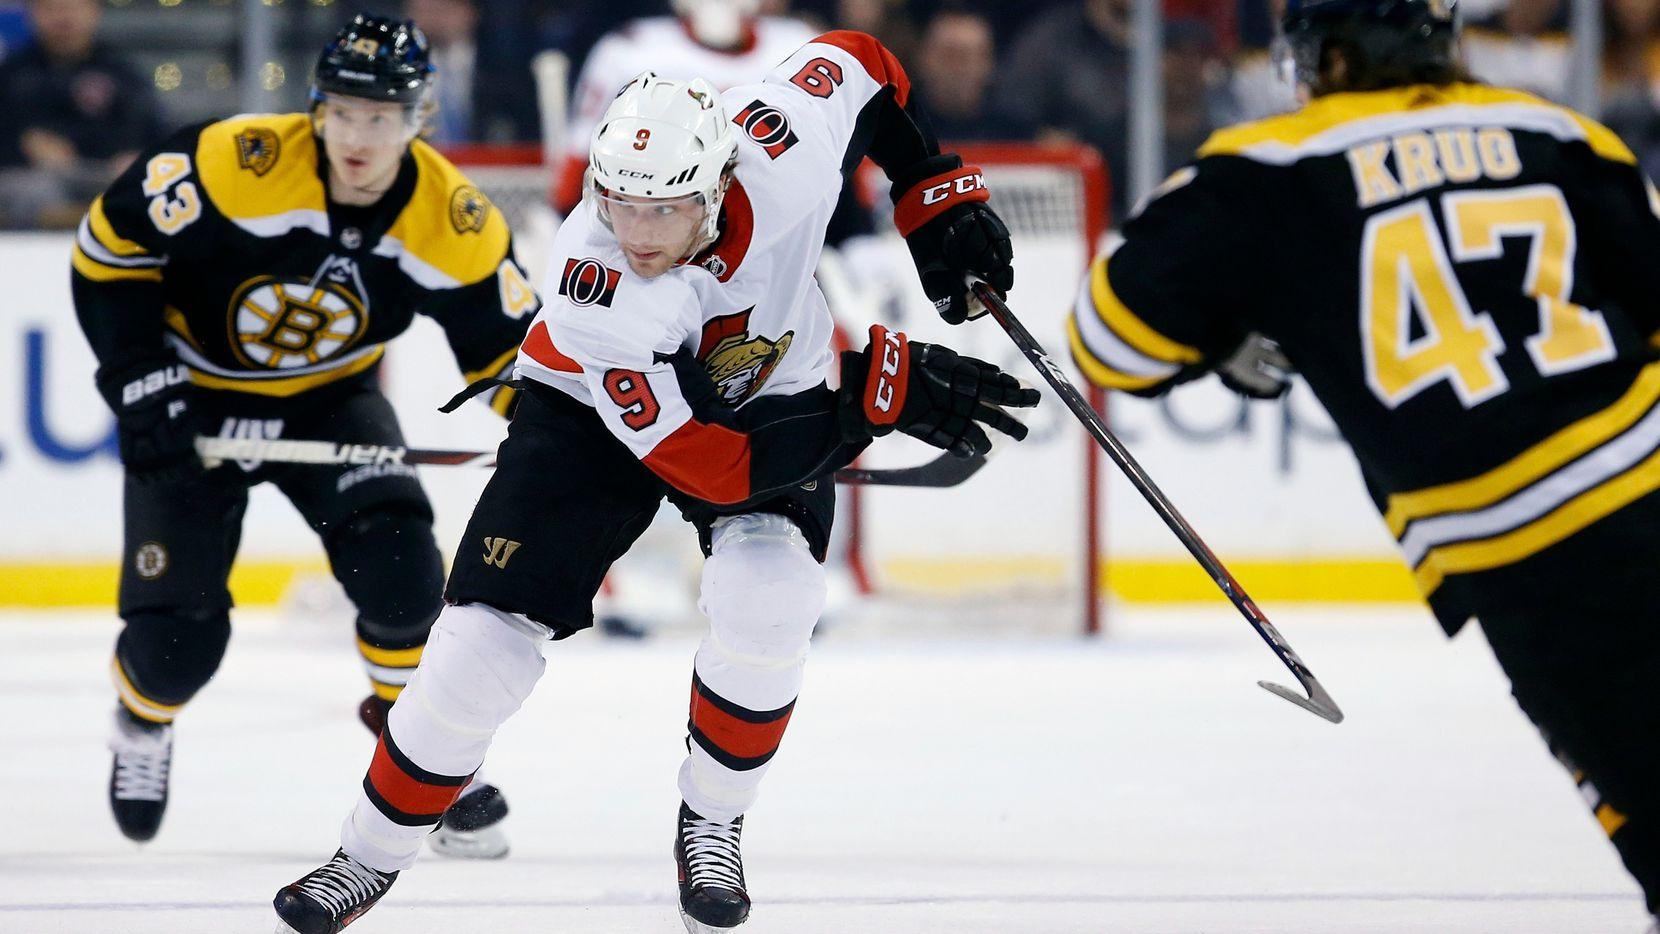 Ottawa Senators' Bobby Ryan (9) skates during the first period of an NHL hockey game against the Boston Bruins in Boston, Saturday, April 7, 2018. (AP Photo/Michael Dwyer)